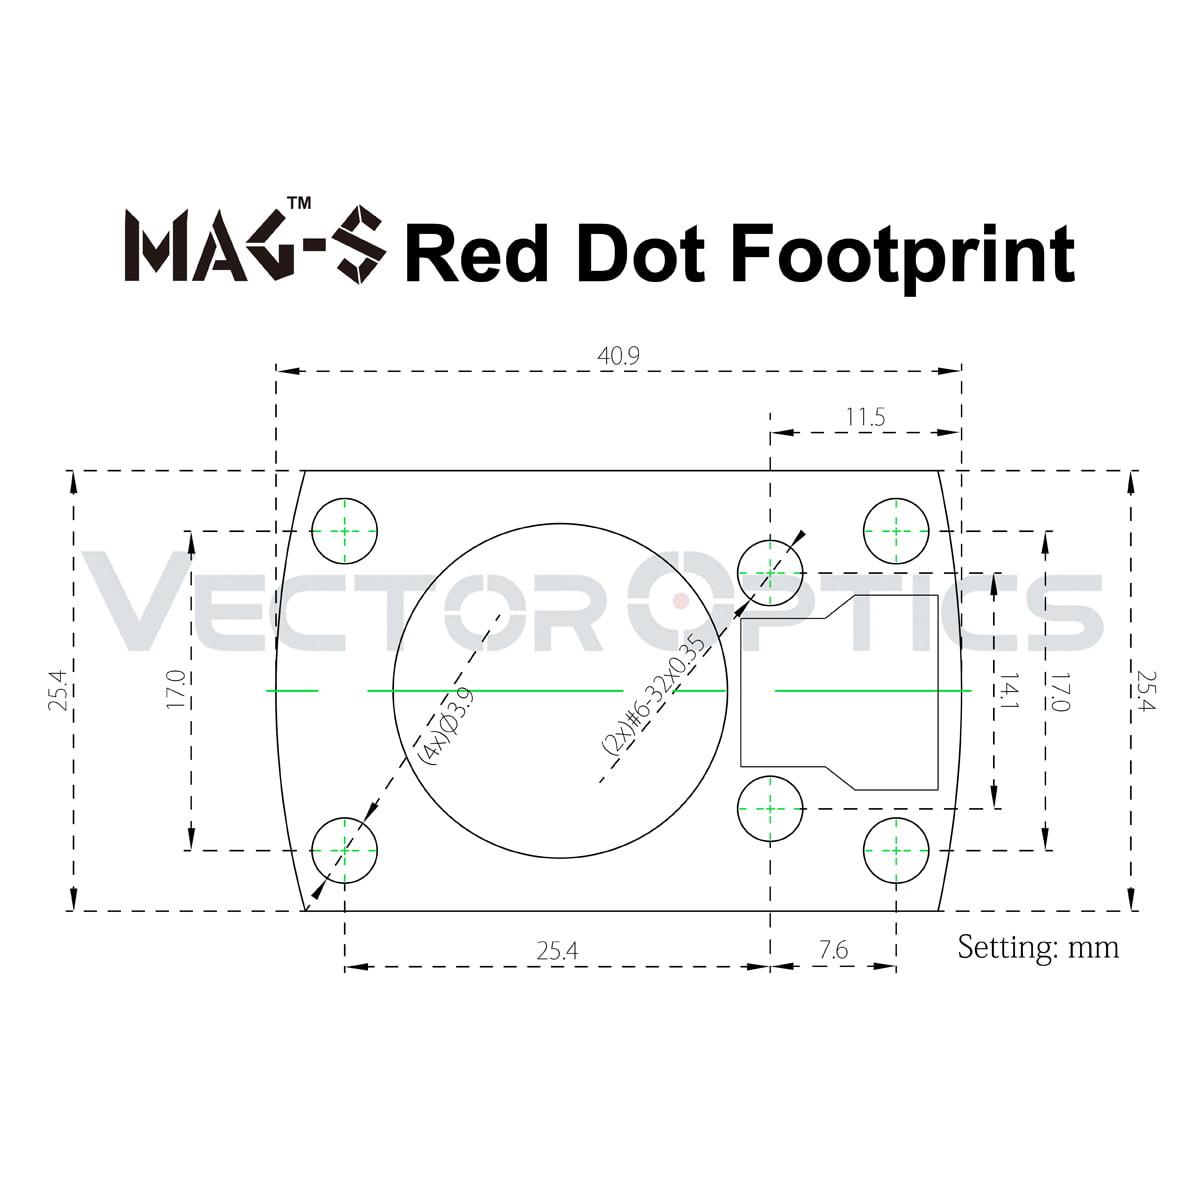 VO MAG-S Footprint Acom Diagram